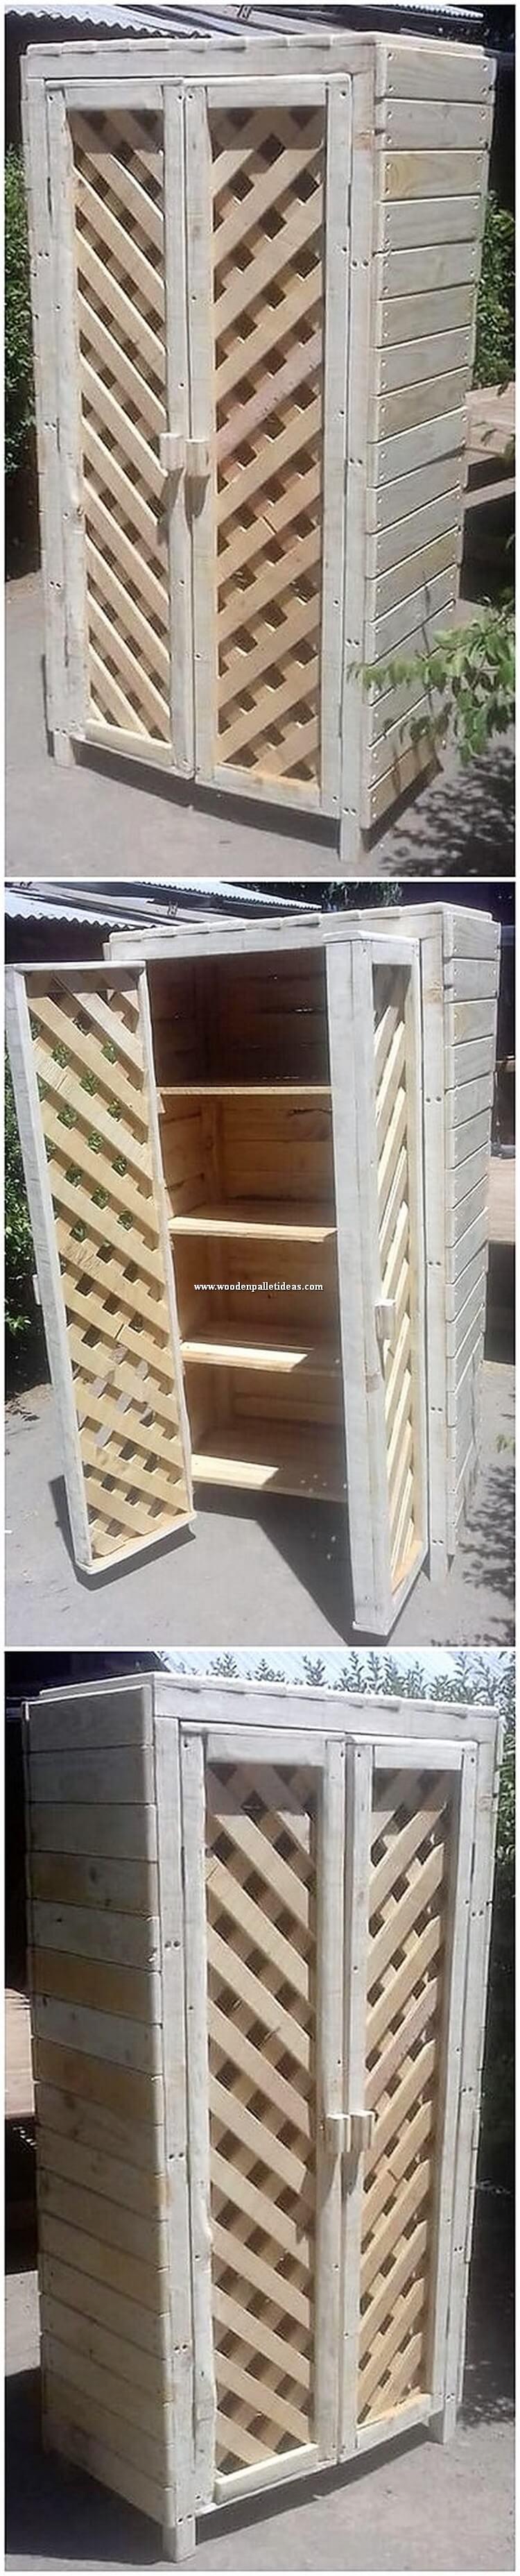 Pallet Wardrobe or Cabinet